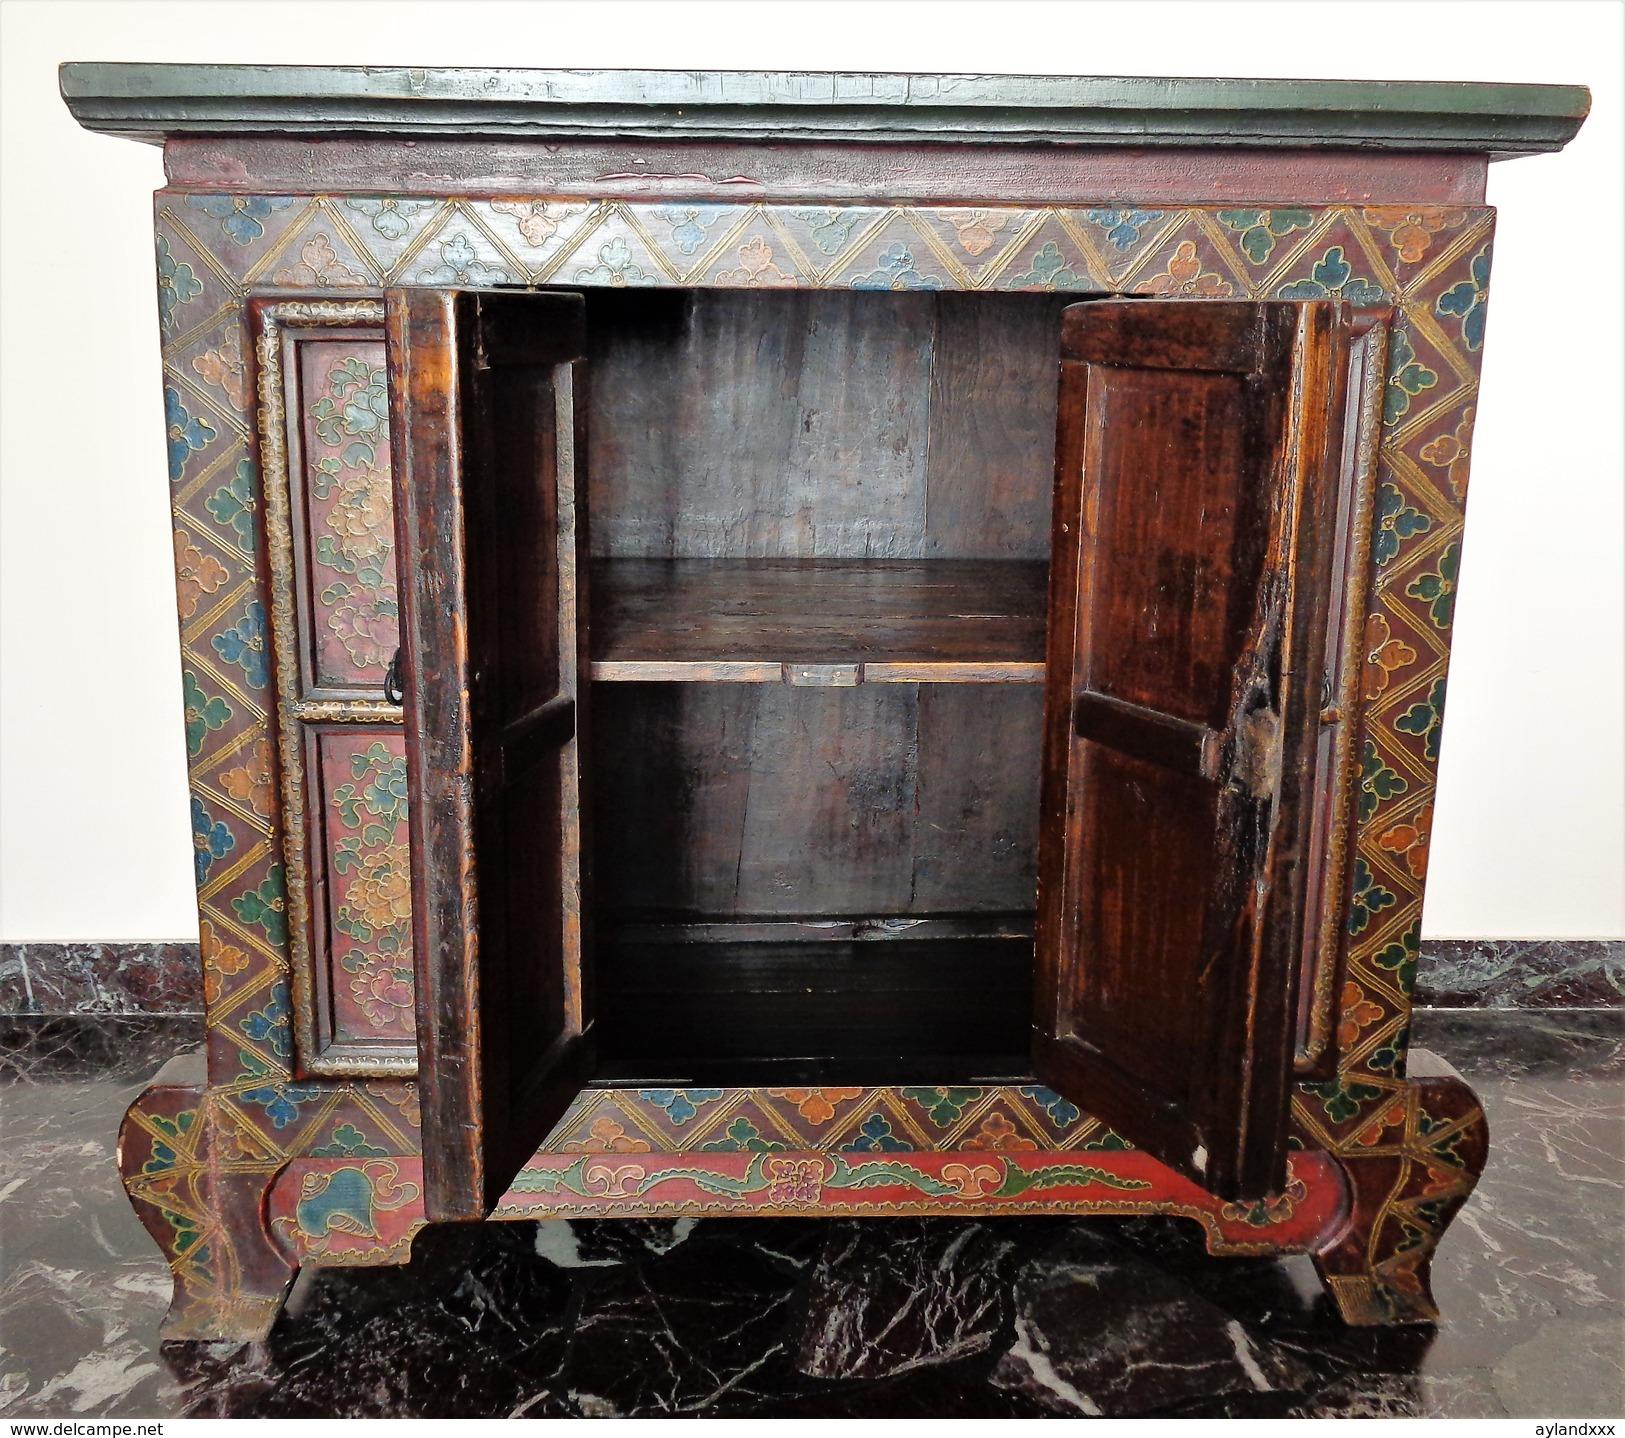 Tibetan Antique Painted Wood Cabinet - Arte Orientale